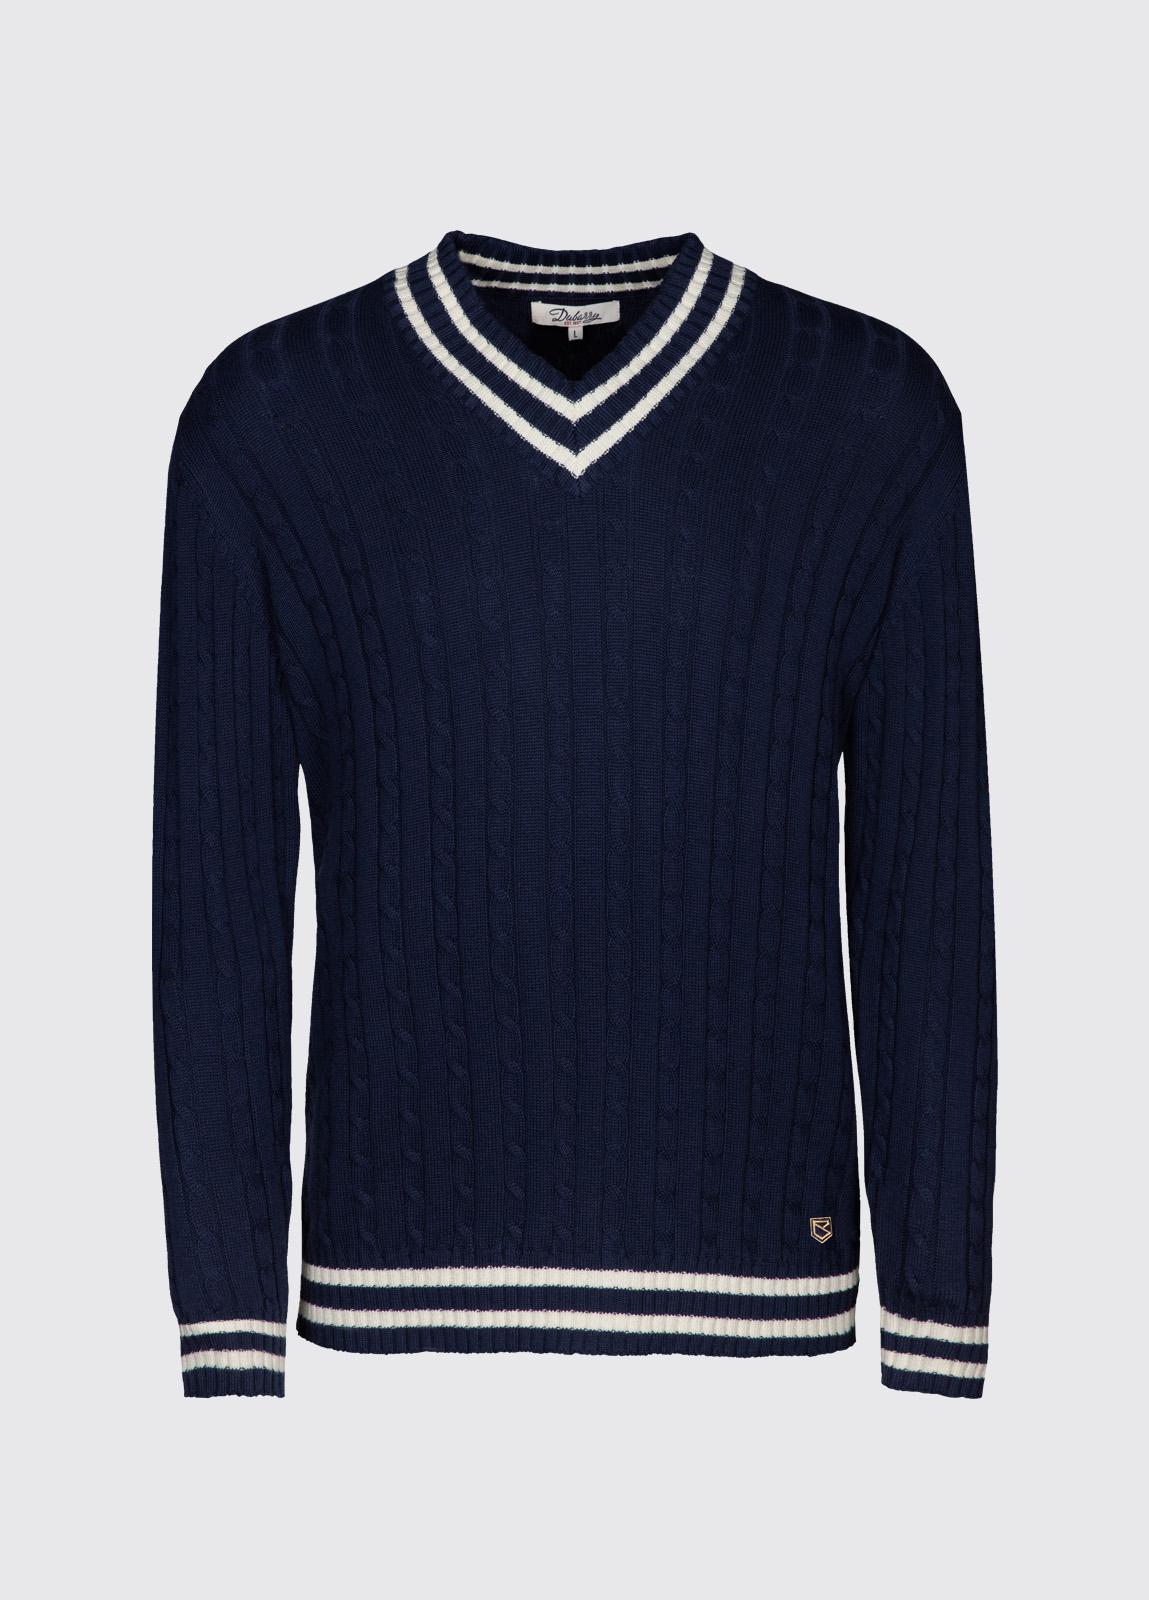 Rosbeg Sweater - Navy